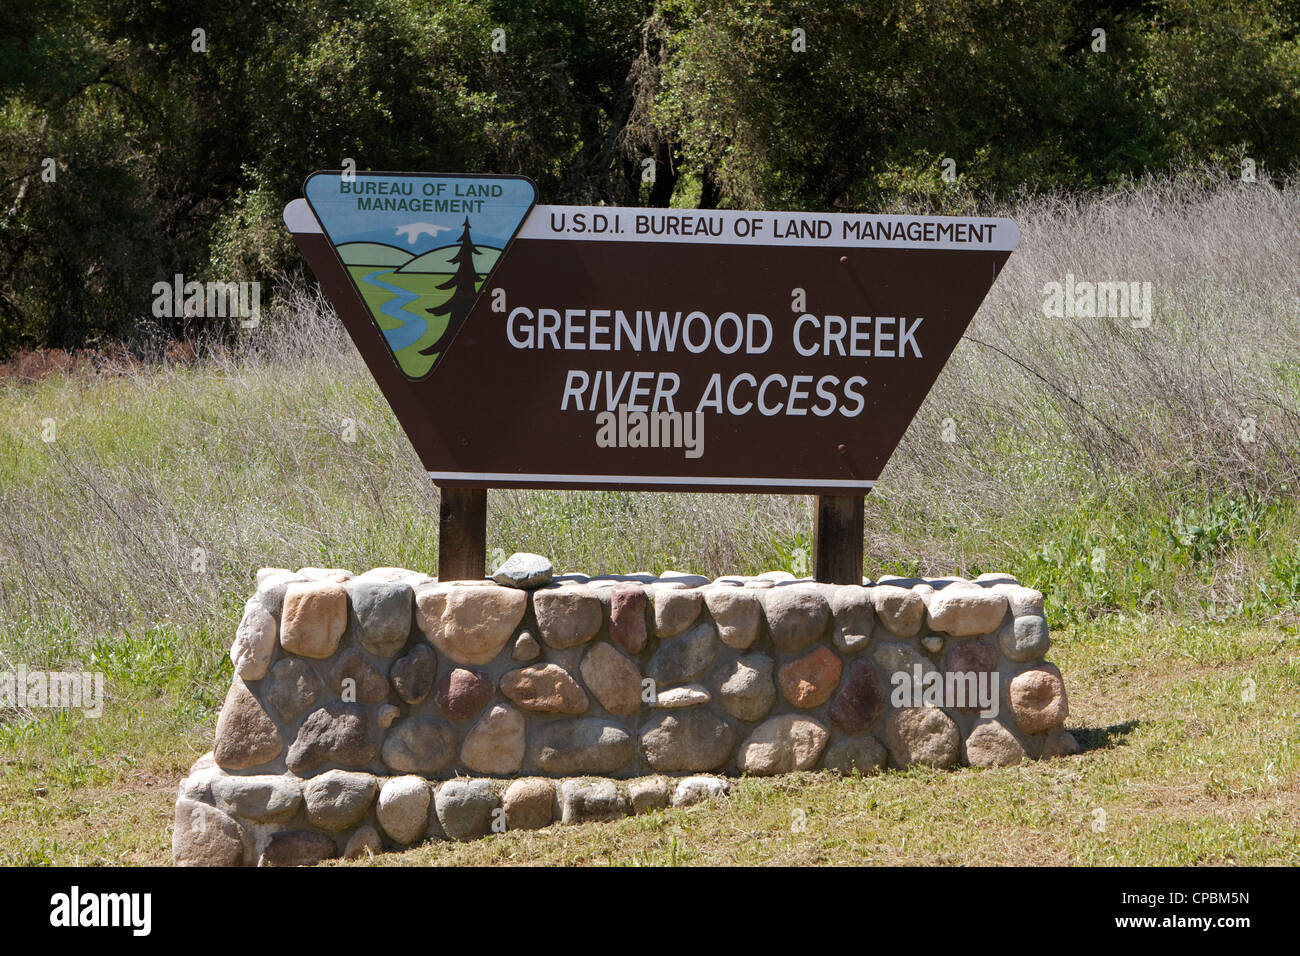 Greenwood Bach Fluss Zugang Zeichen auf der South Fork des American River Stockbild